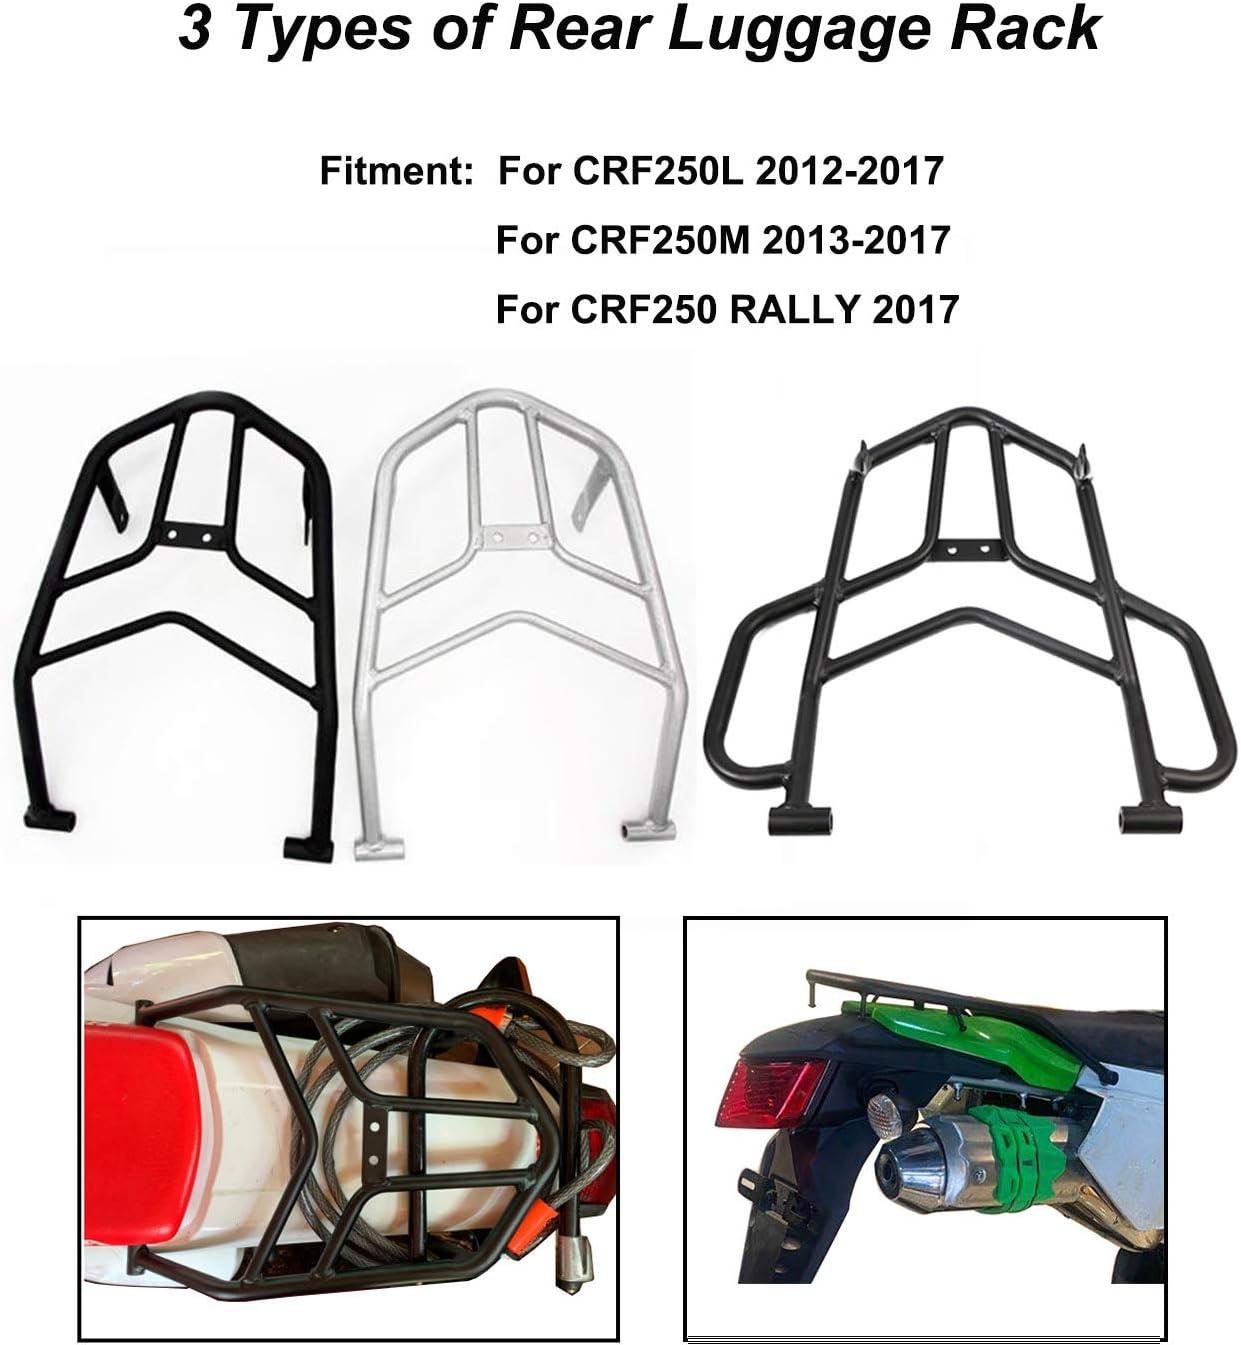 Black Rear Luggage Carry Rack Fits Honda CRF250L 2013 2014 2015 2016 2017 2018